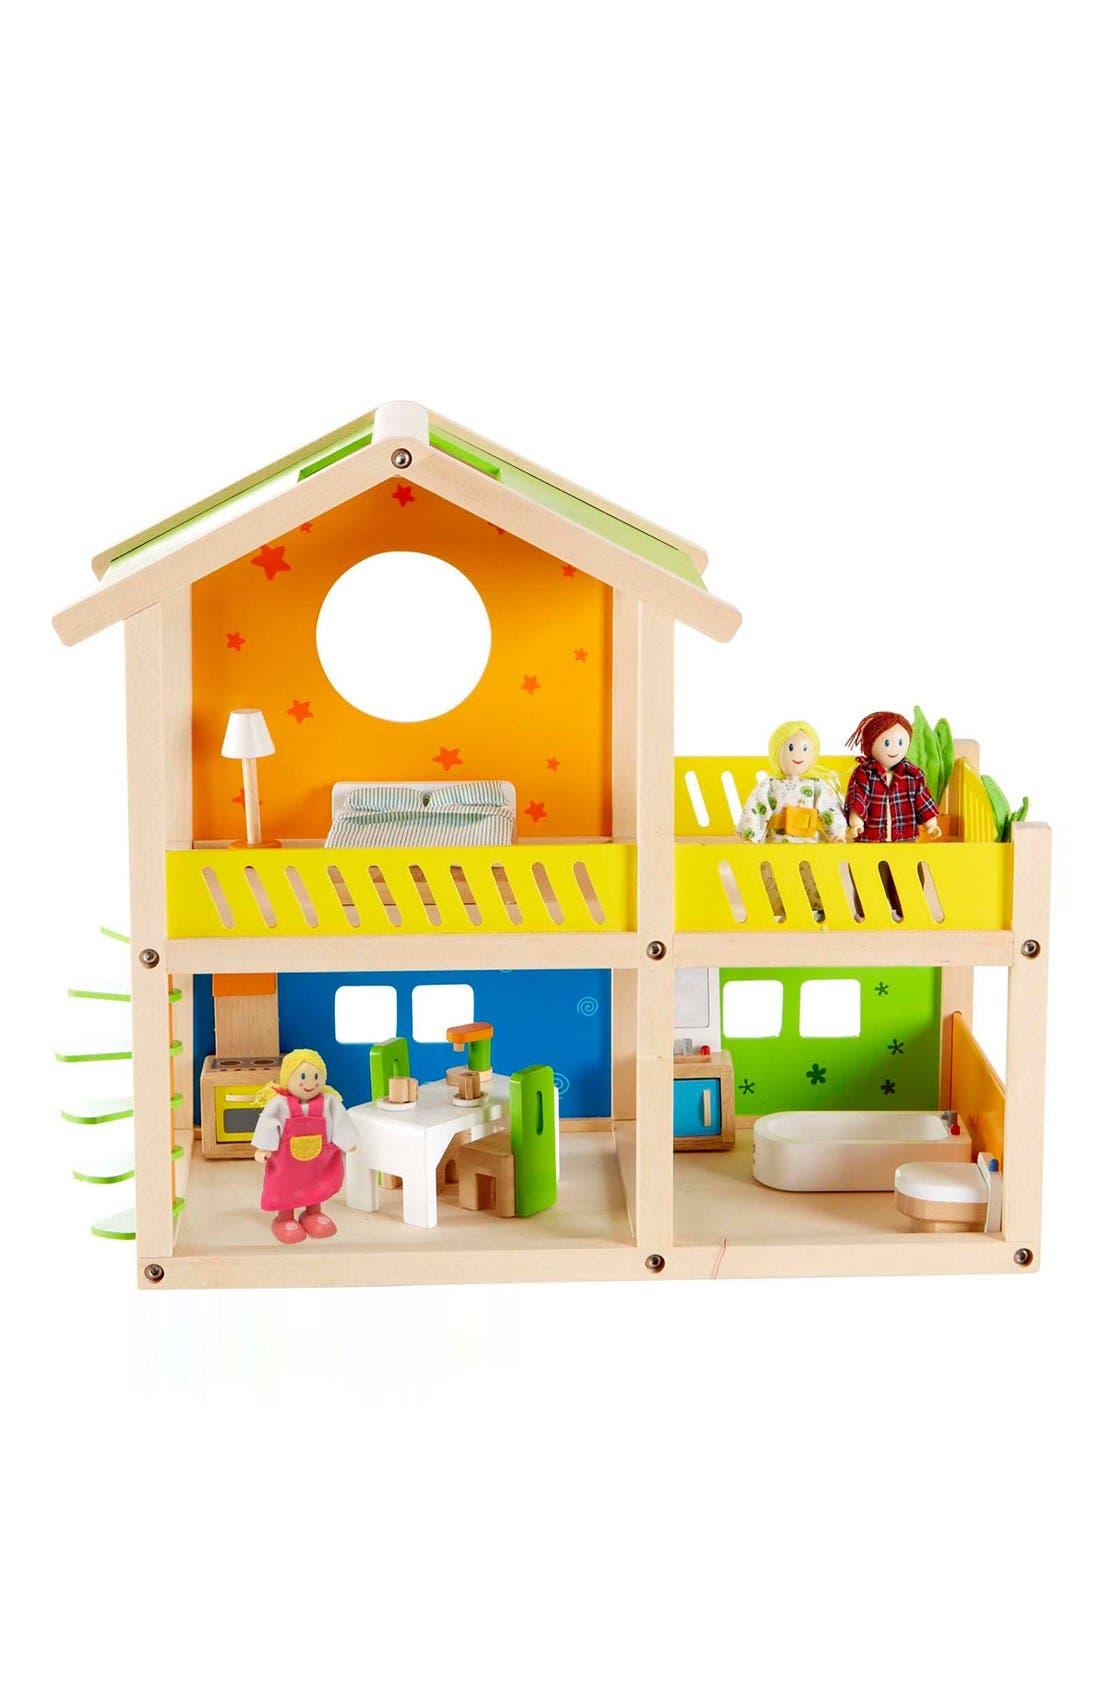 'Happy Villa' Wooden Dollhouse,                             Main thumbnail 1, color,                             000